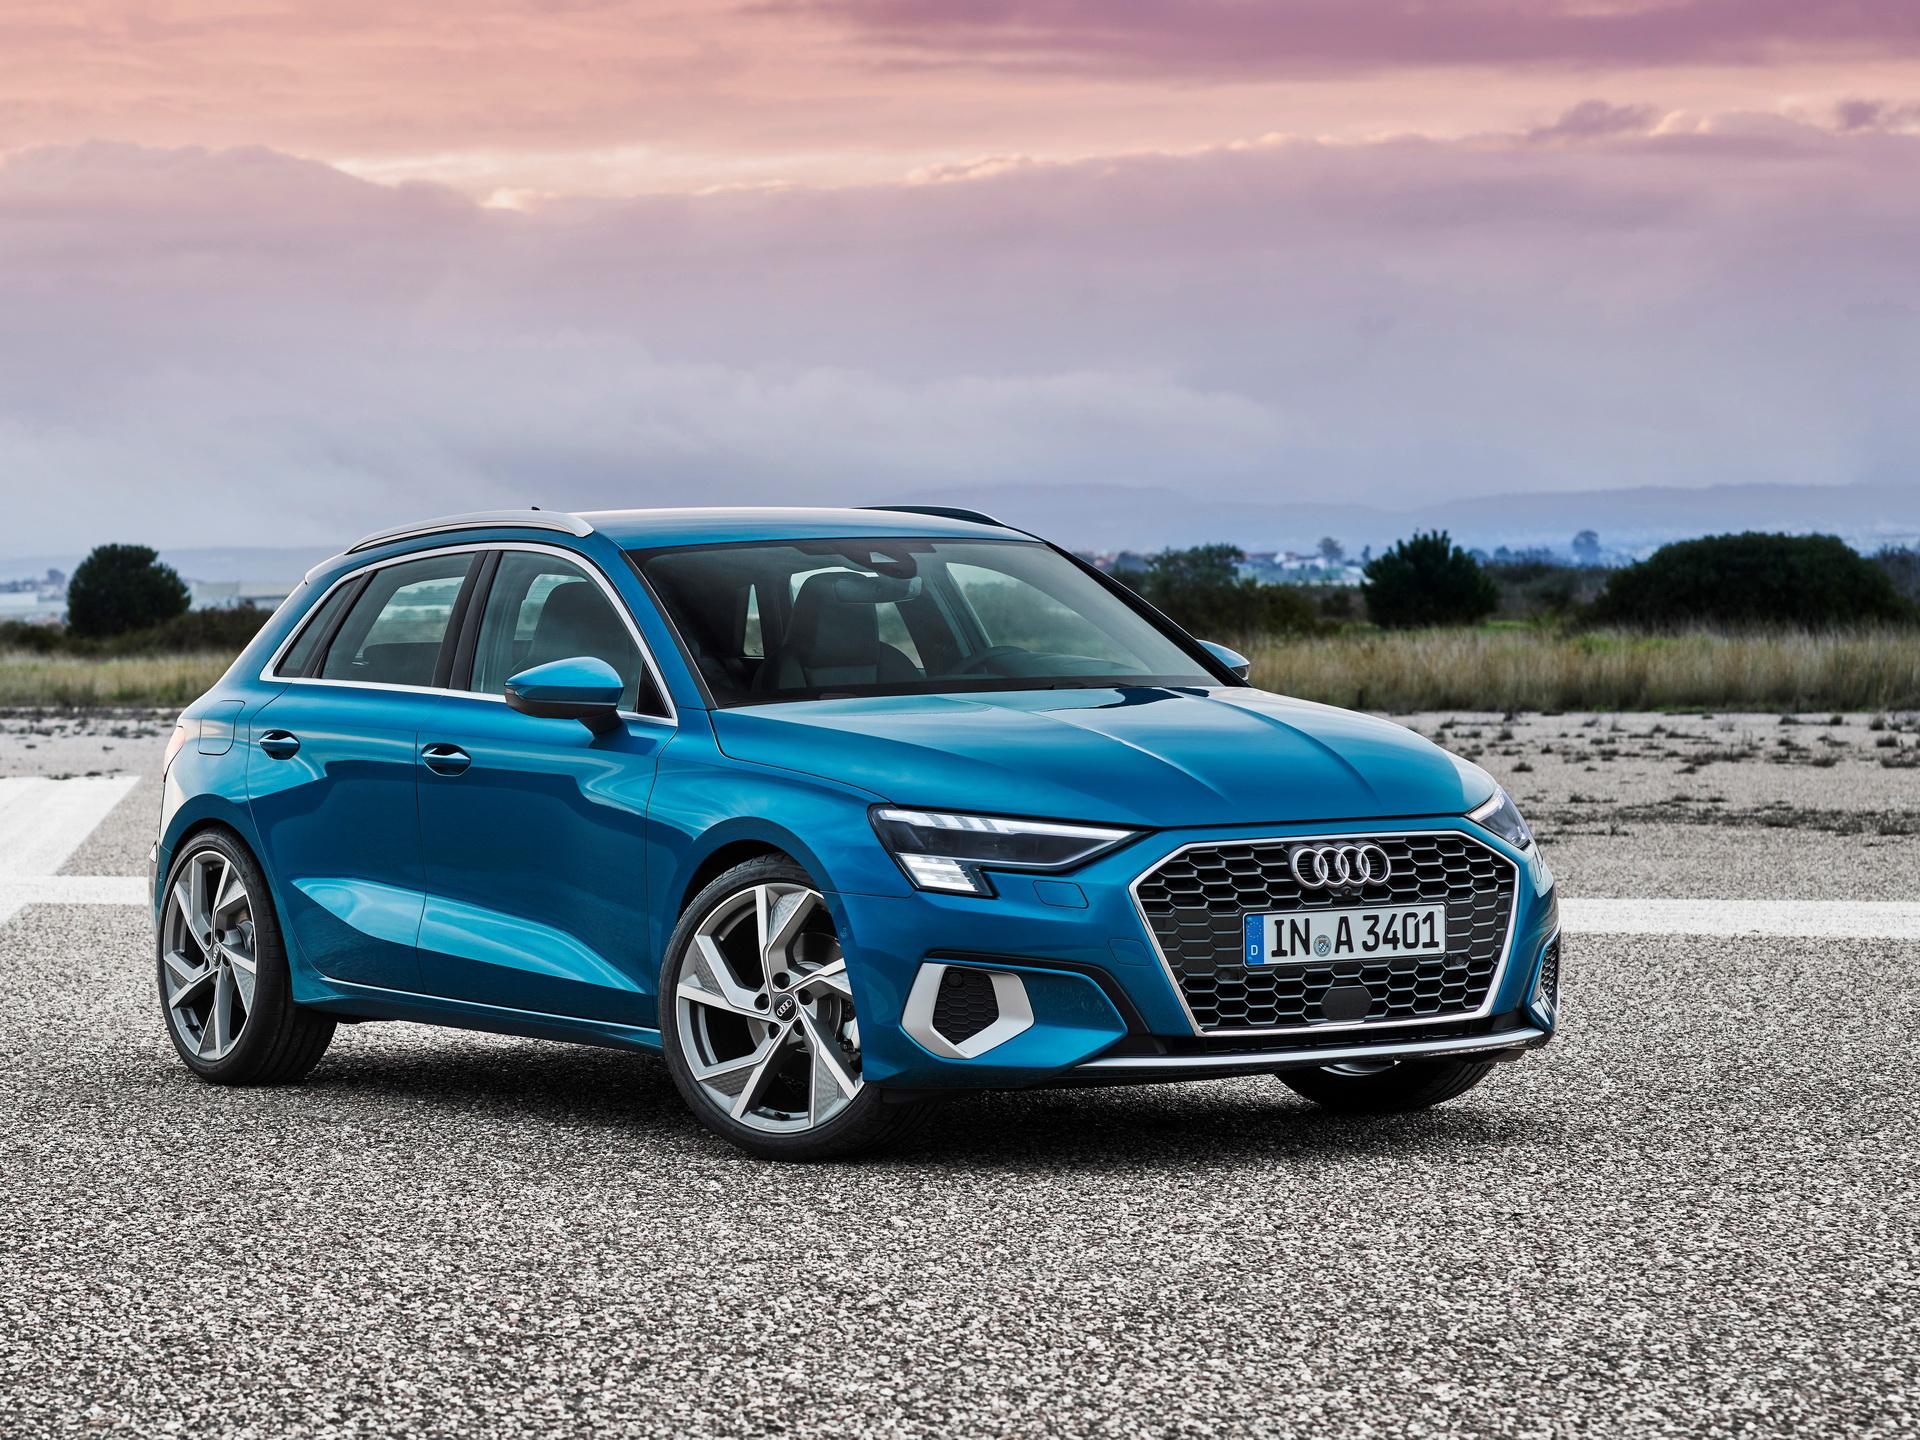 Kelebihan Audi M3 Top Model Tahun Ini